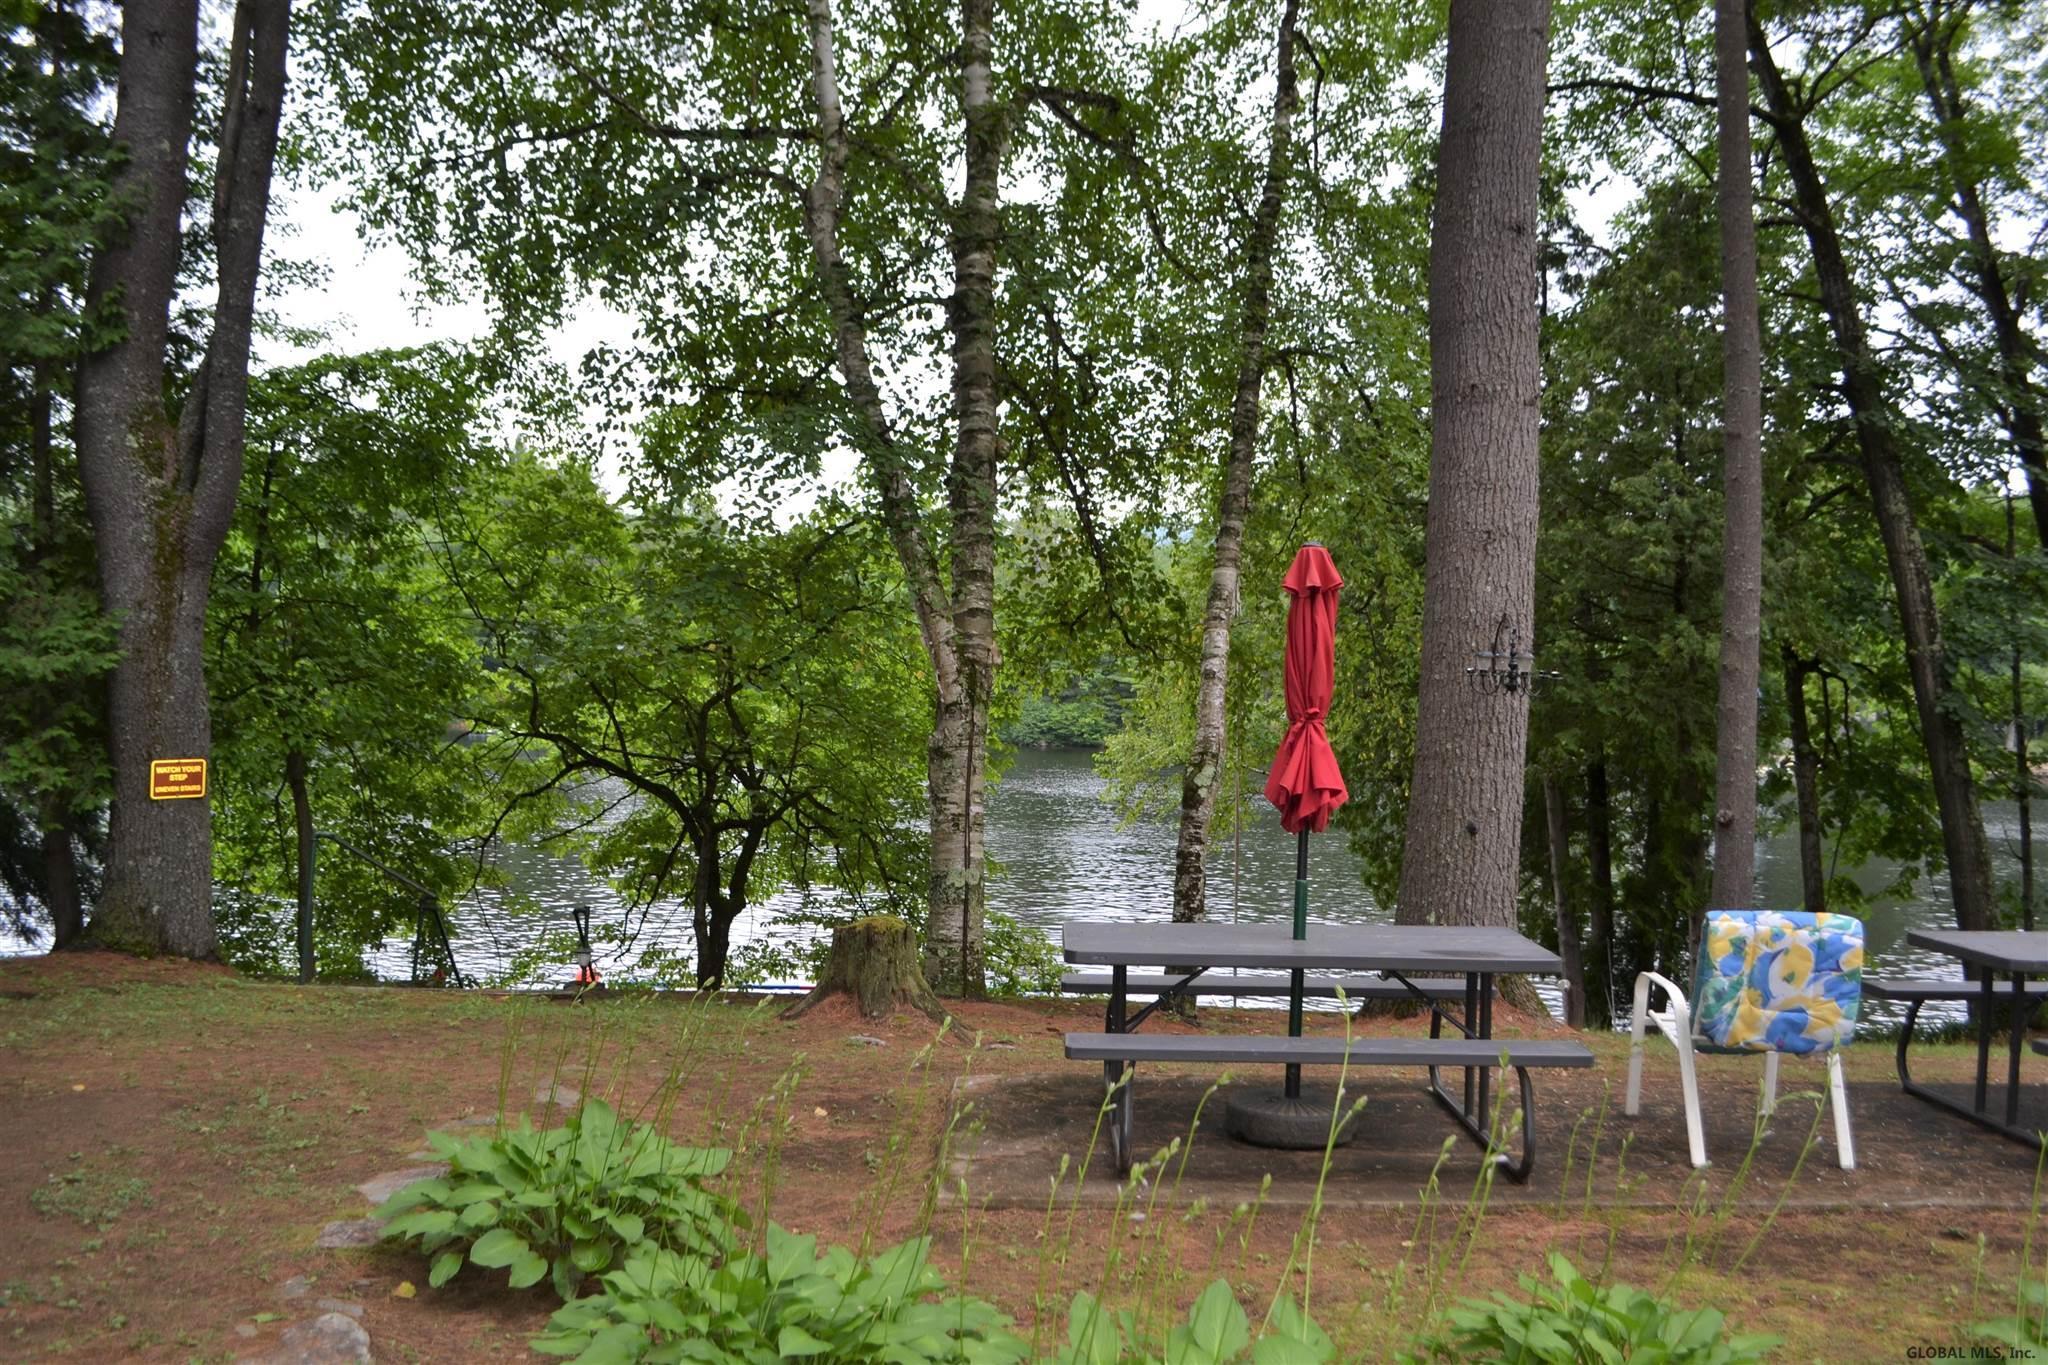 Lake Luzerne image 3